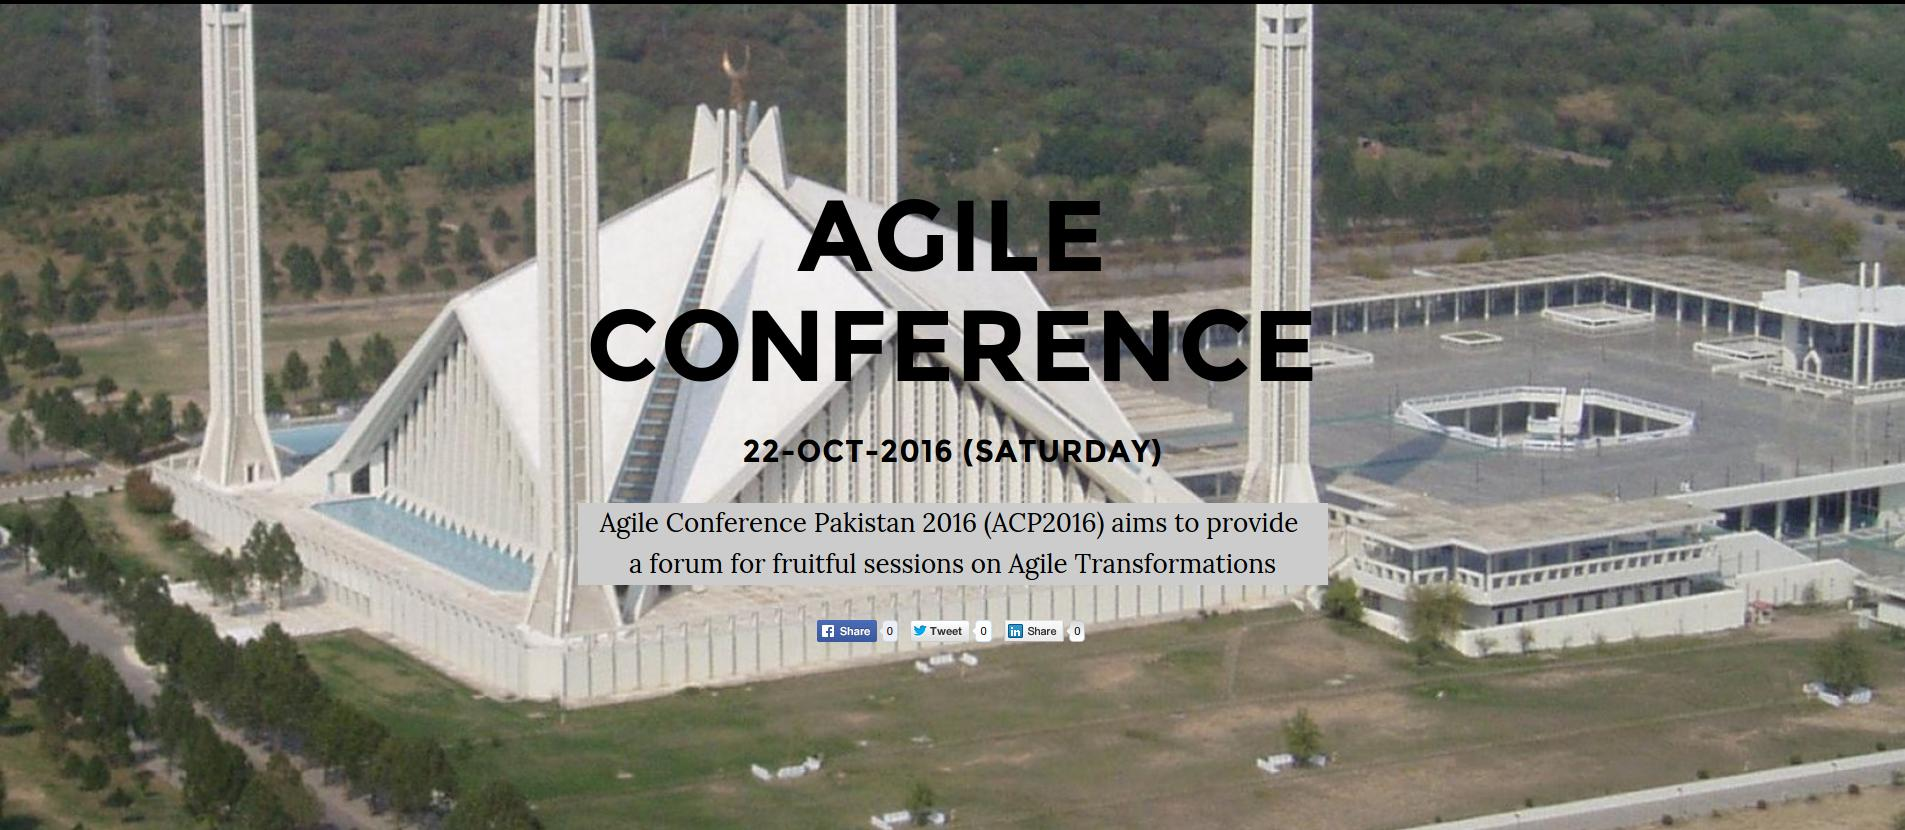 ISB:2016-10-22:Agile Conference Pakistan - ACP2016